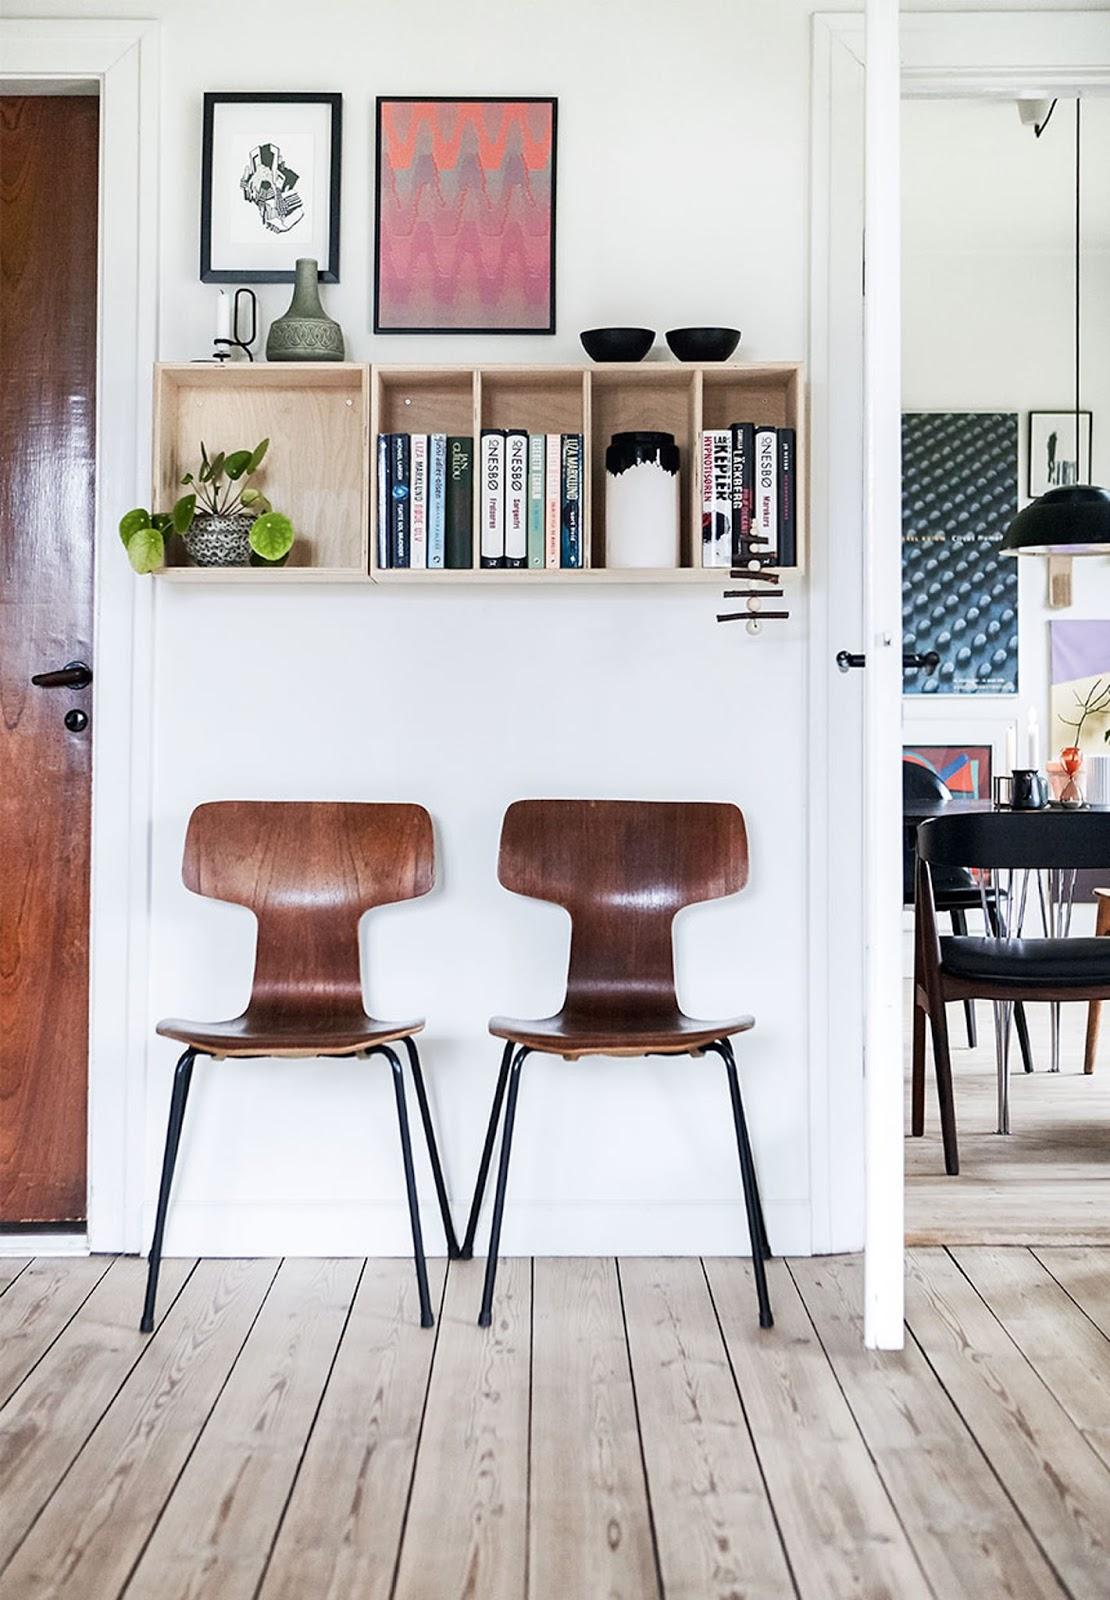 fritz hansen chairs, wall art, bookshelf, nordic home